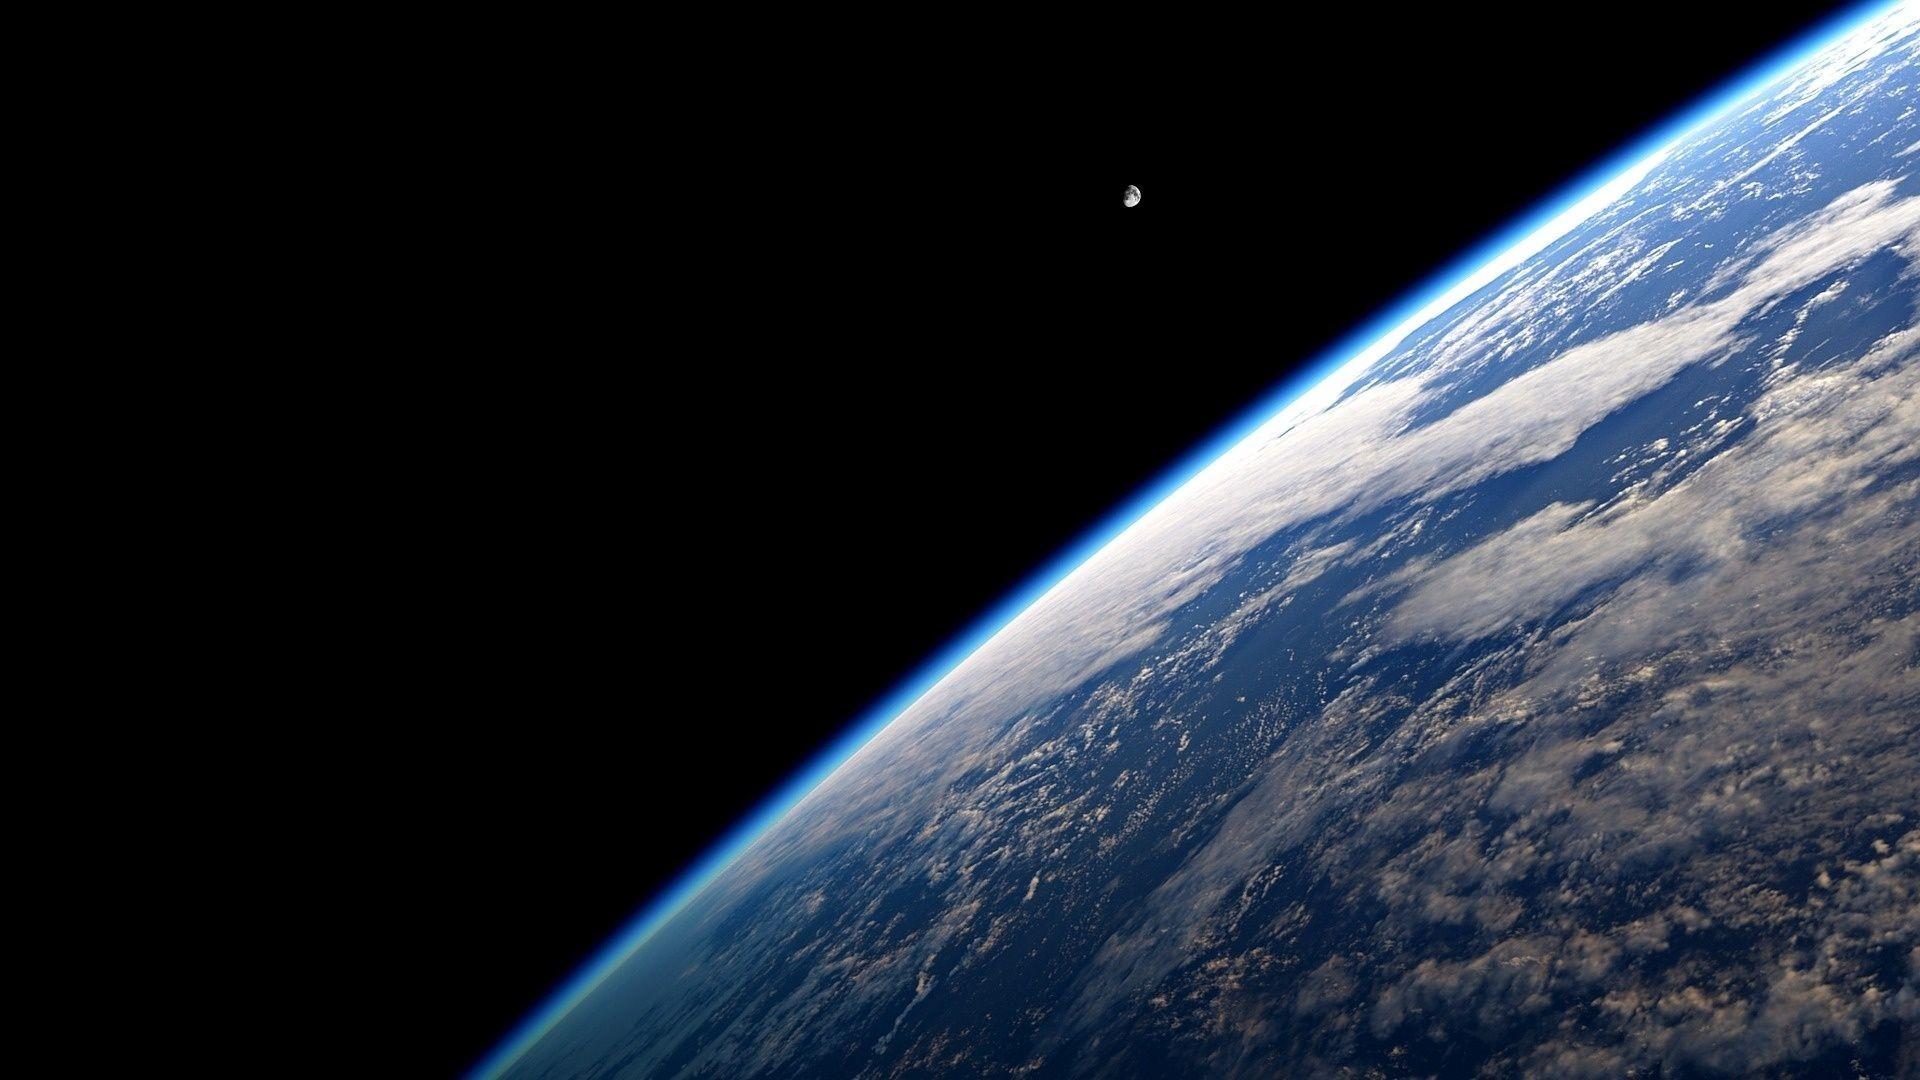 Earth Space wallpaper